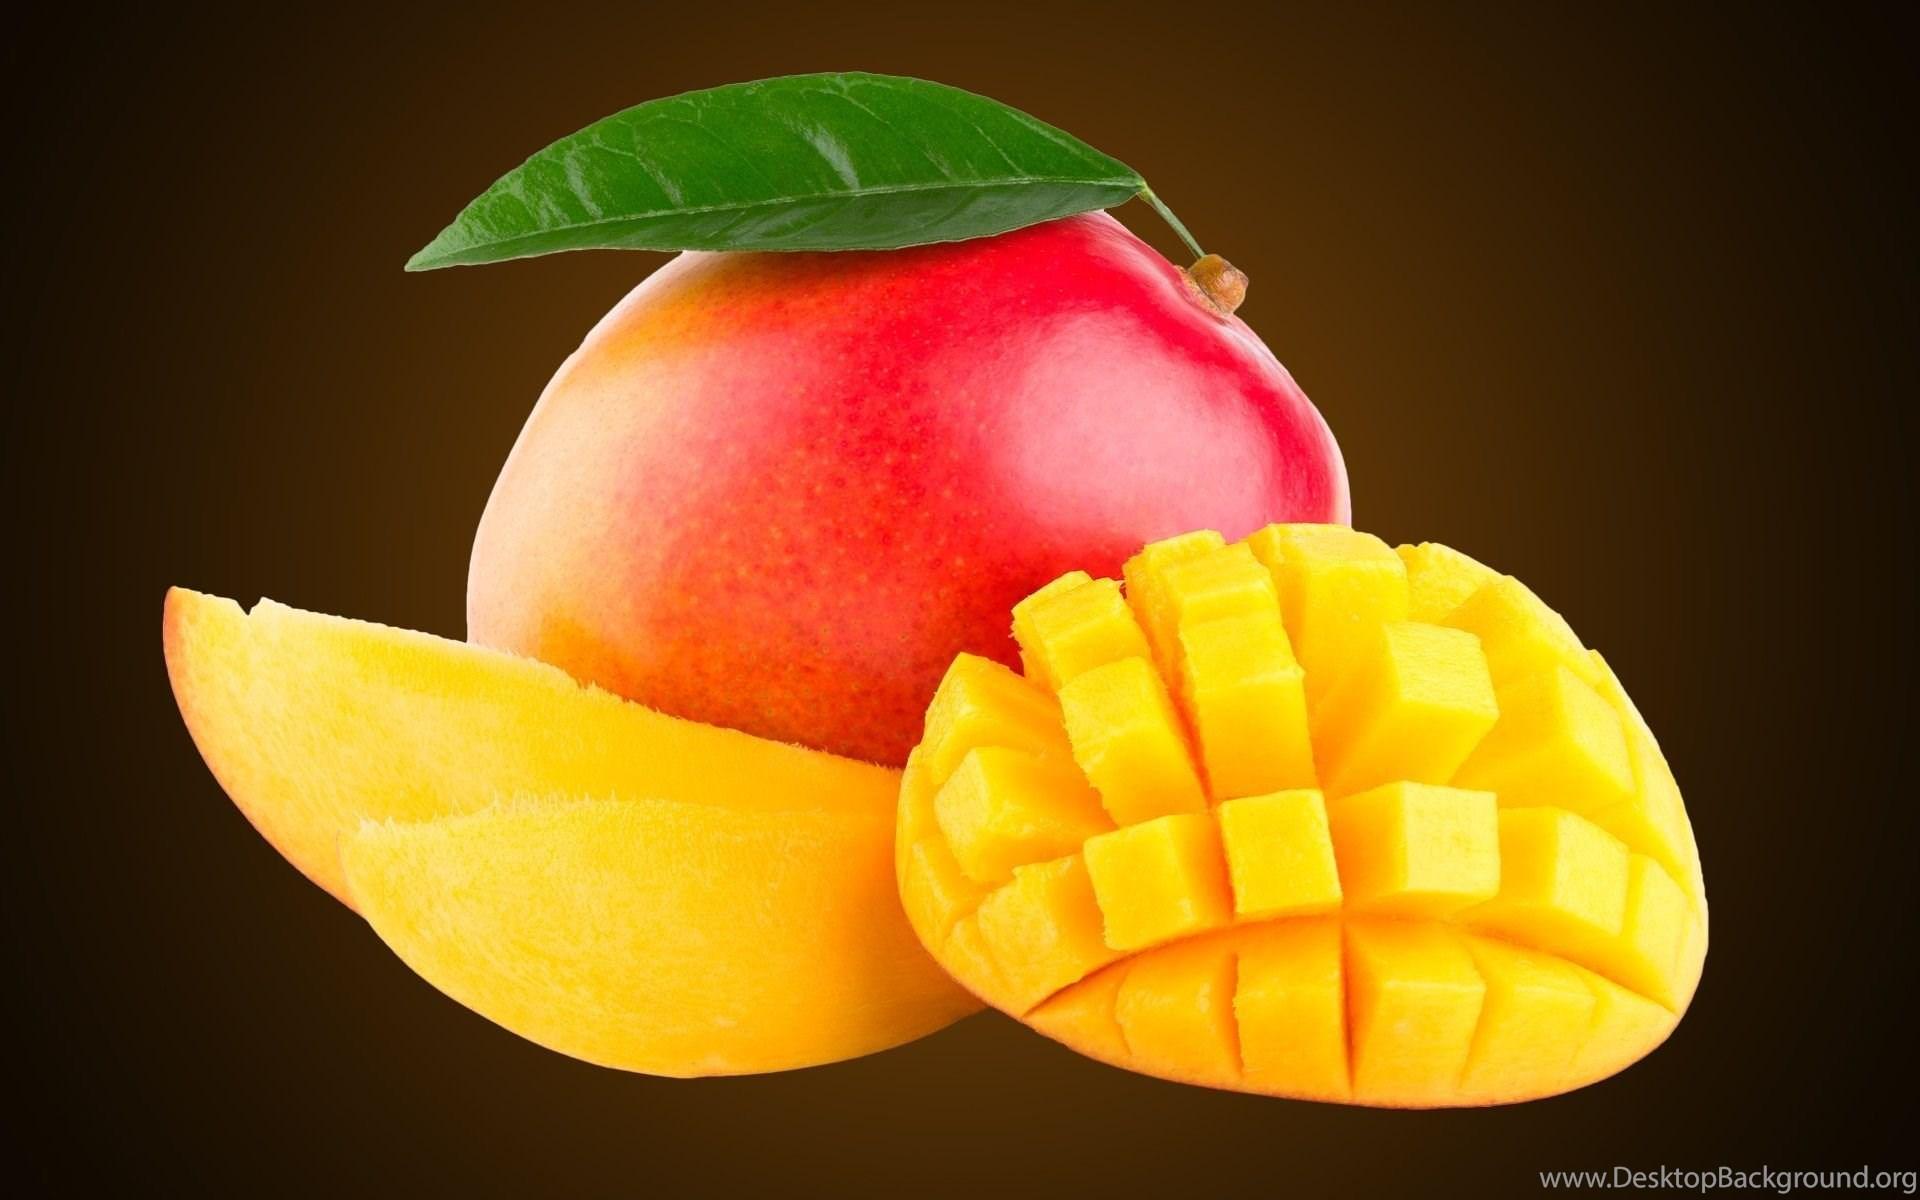 Widescreen Mango Fruit Wallpaper Hd 2210279 Hd Wallpaper Backgrounds Download